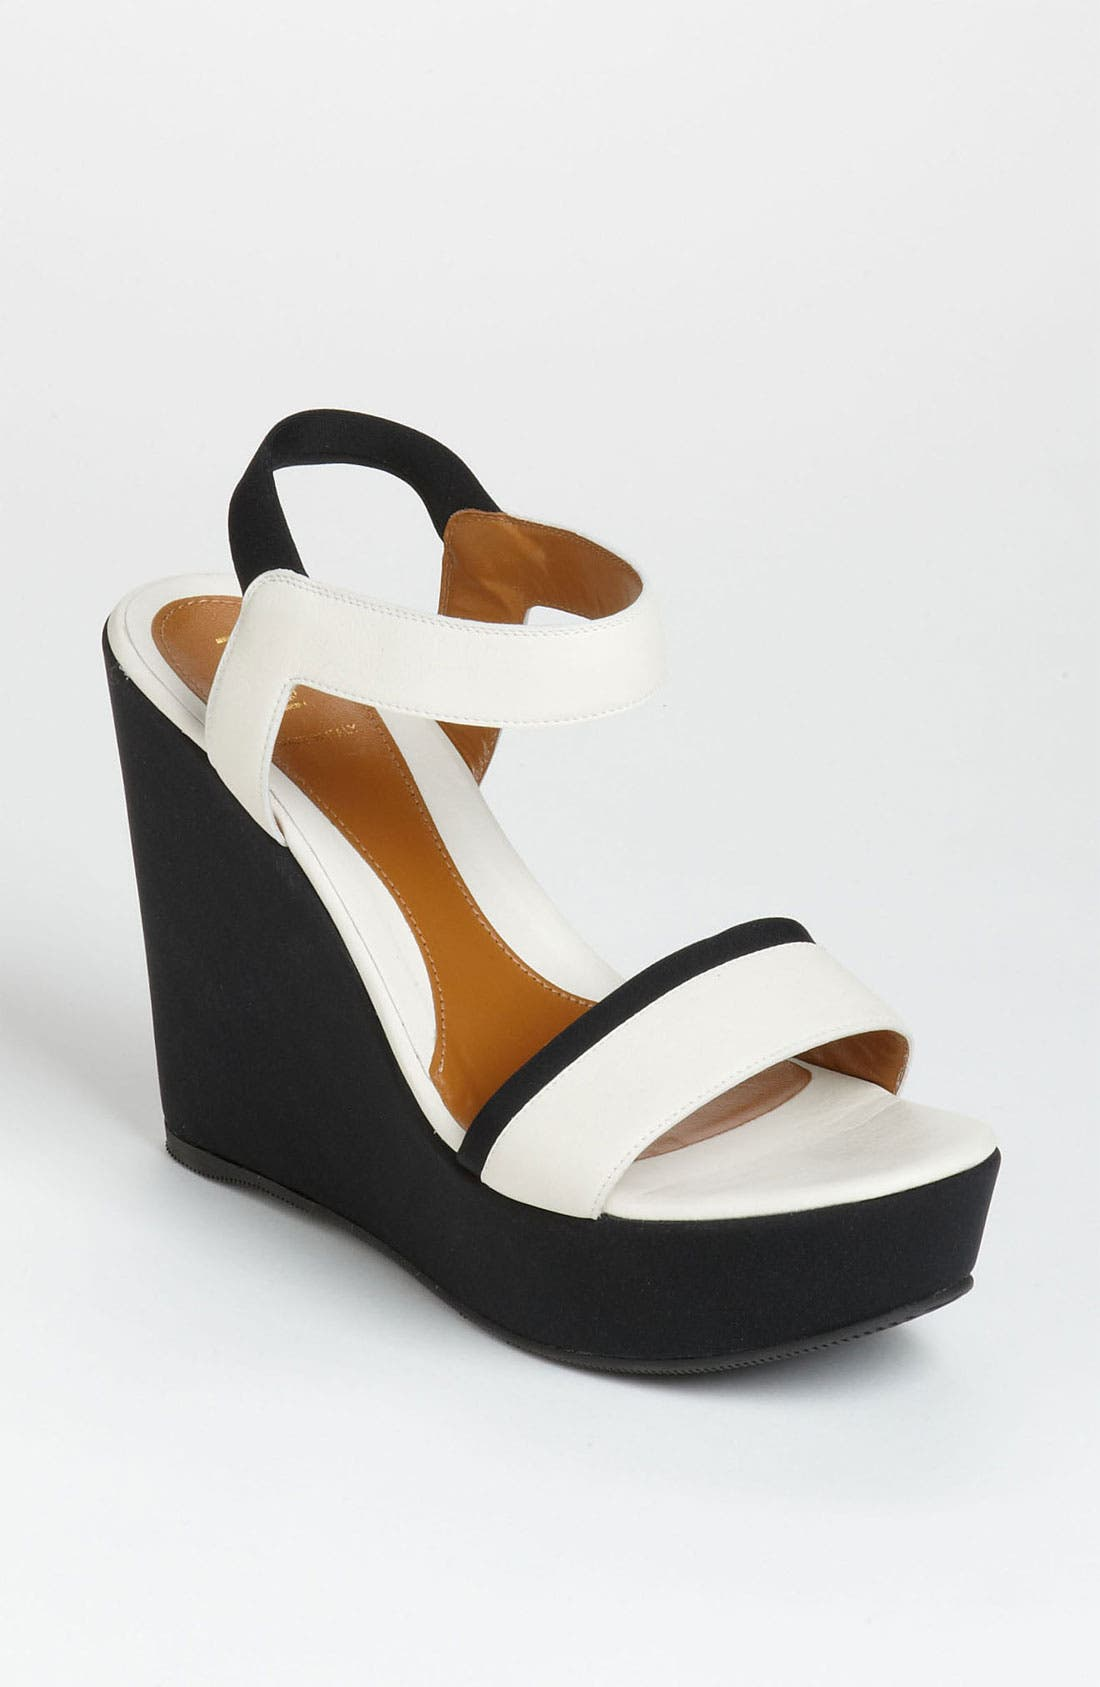 Alternate Image 1 Selected - Fendi Ankle Strap Wedge Sandal